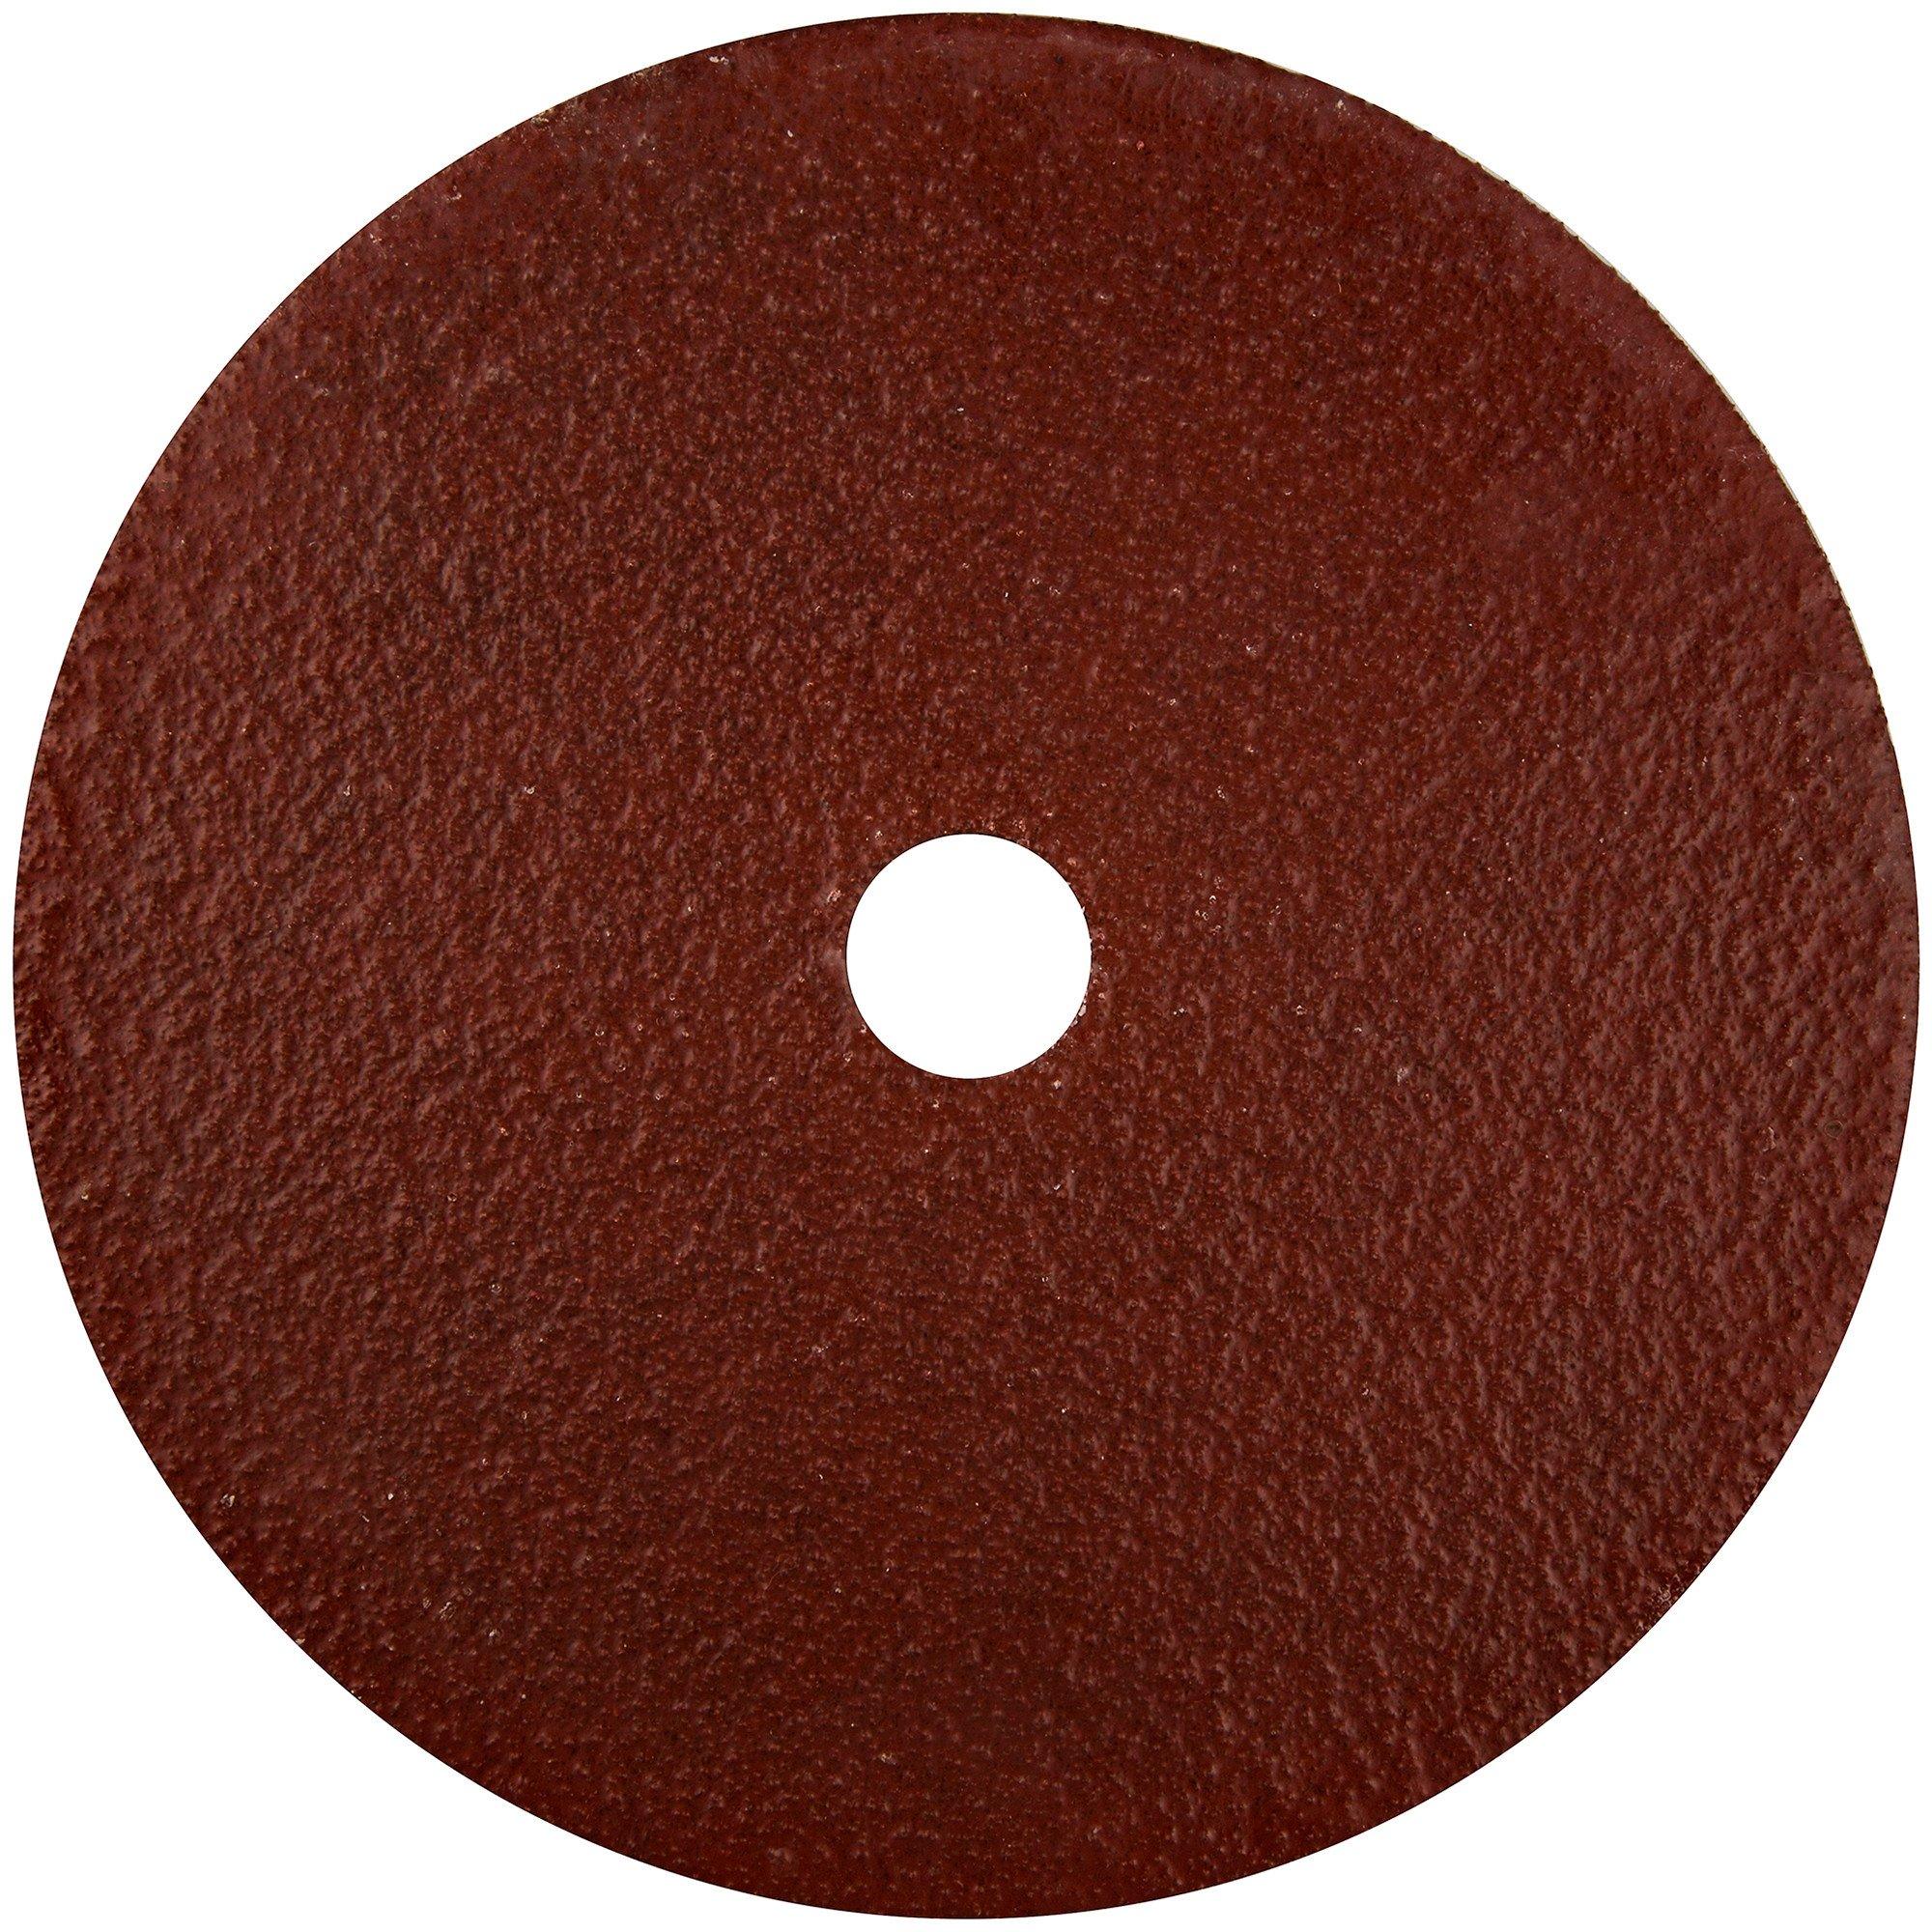 Norton Gemini Metalite F220 Abrasive Disc, Fiber Backing, Aluminum Oxide, 7/8'' Arbor, 7'' Diameter, Grit 60 (Pack of 25)